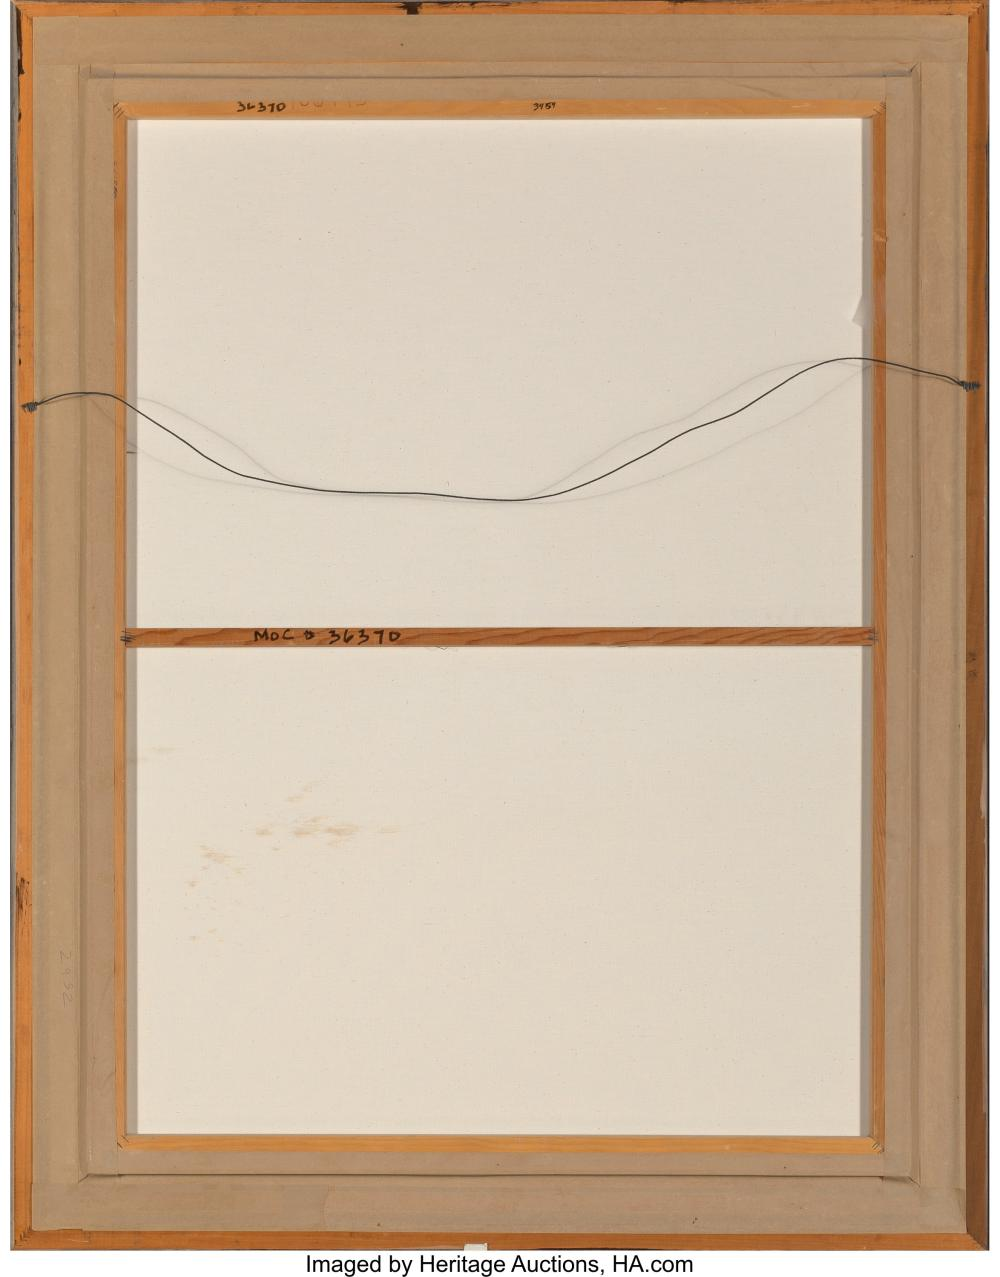 Lot 21100: Marc Inge Saastad (American, b. 1940) Untitled (Crashing Waves), 1980 Acrylic on